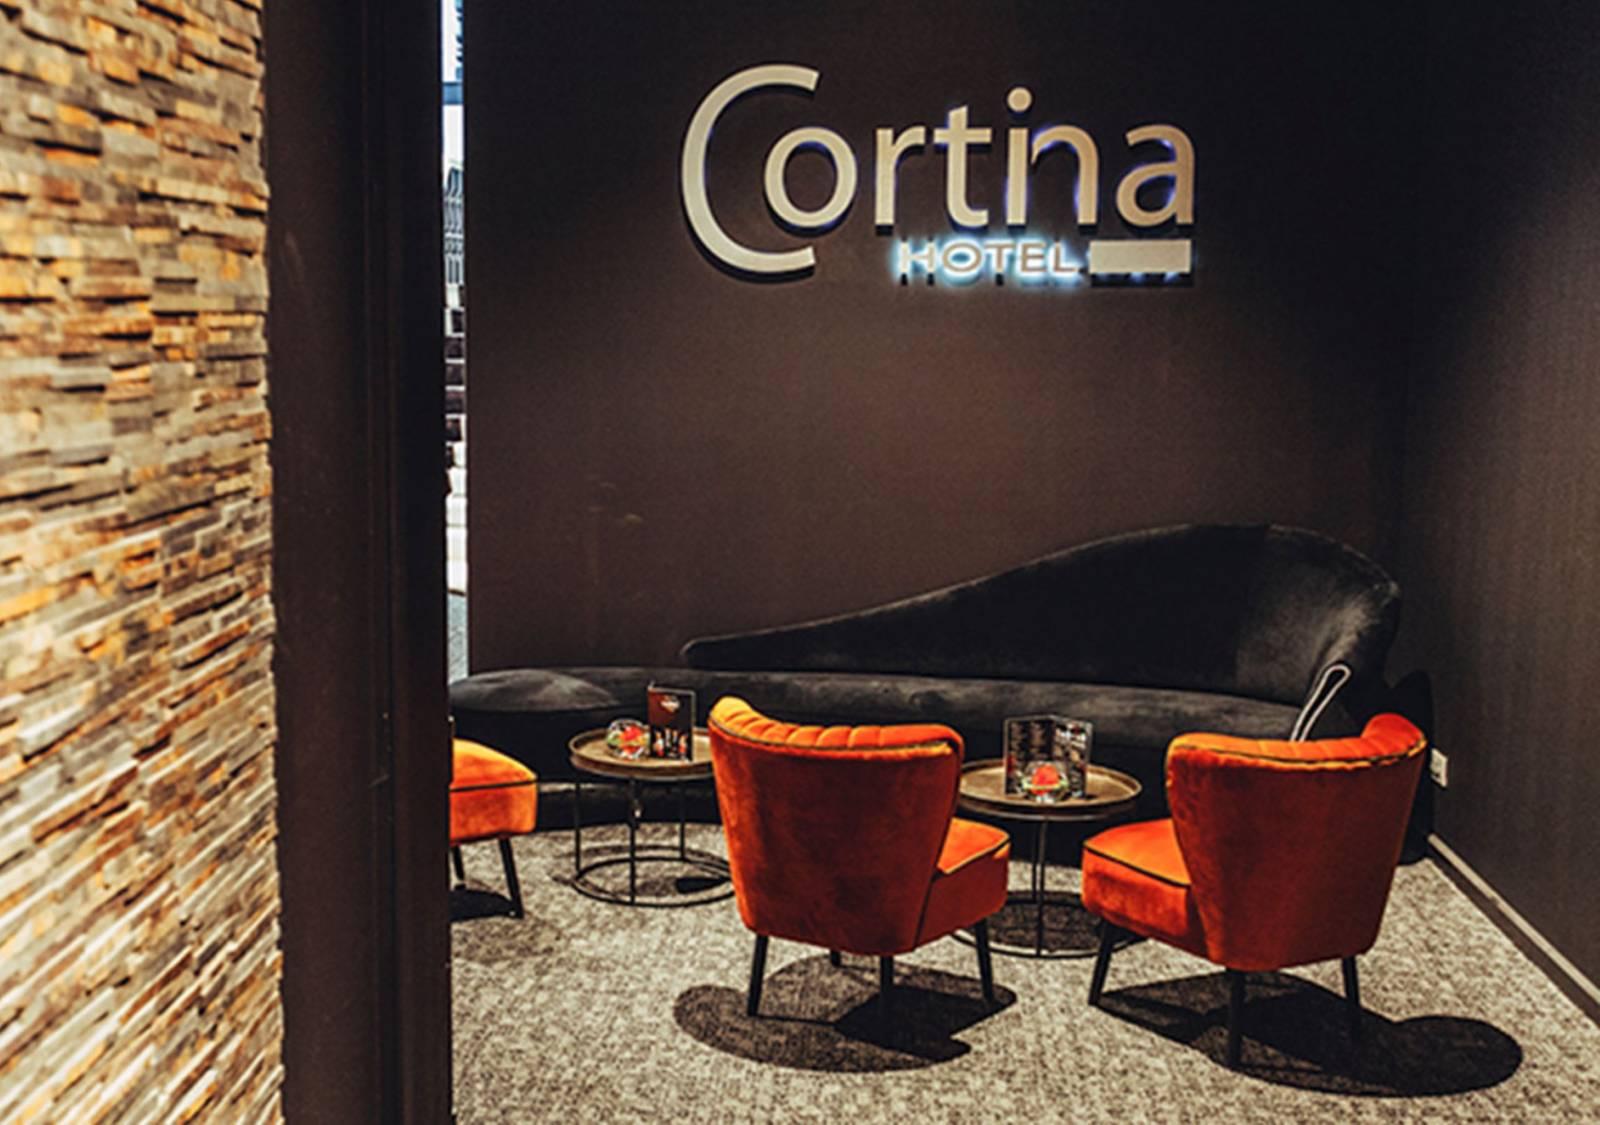 Cortina Wevelgem - Feestzaal - House of Weddings (12)